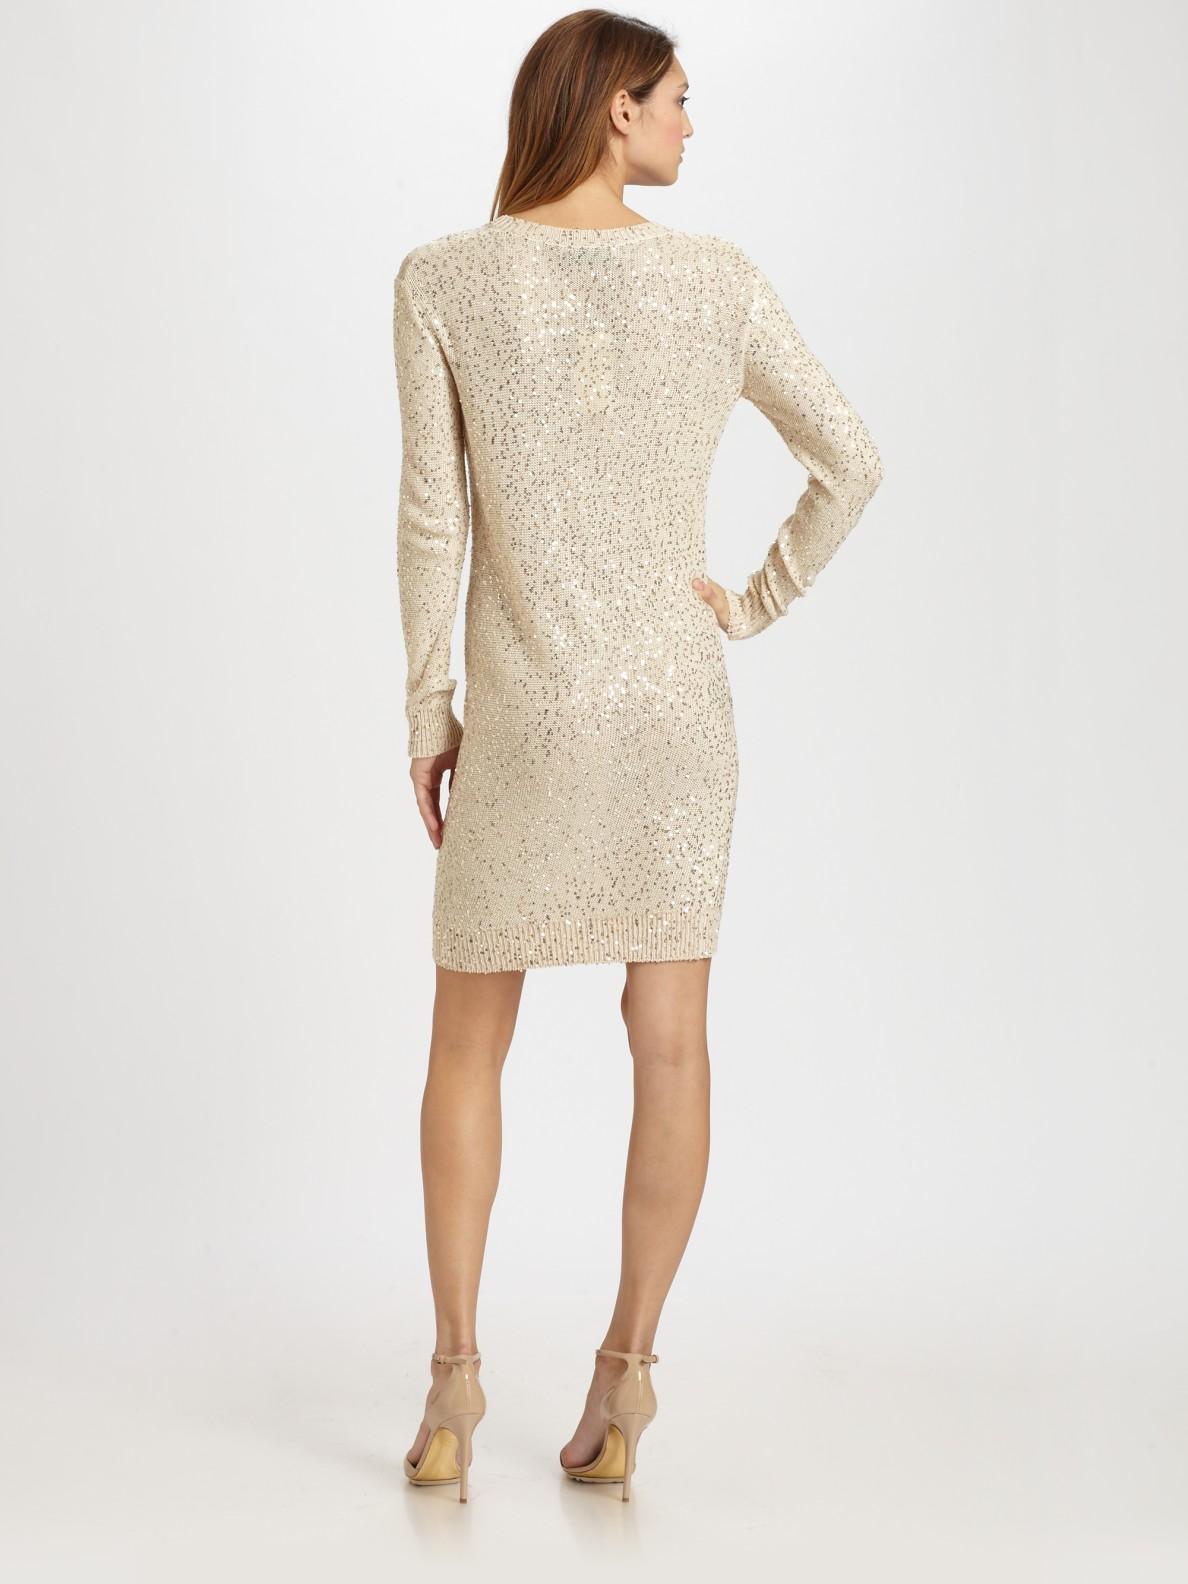 d127c8316f Stella McCartney Sequined Sweater Dress in White - Lyst